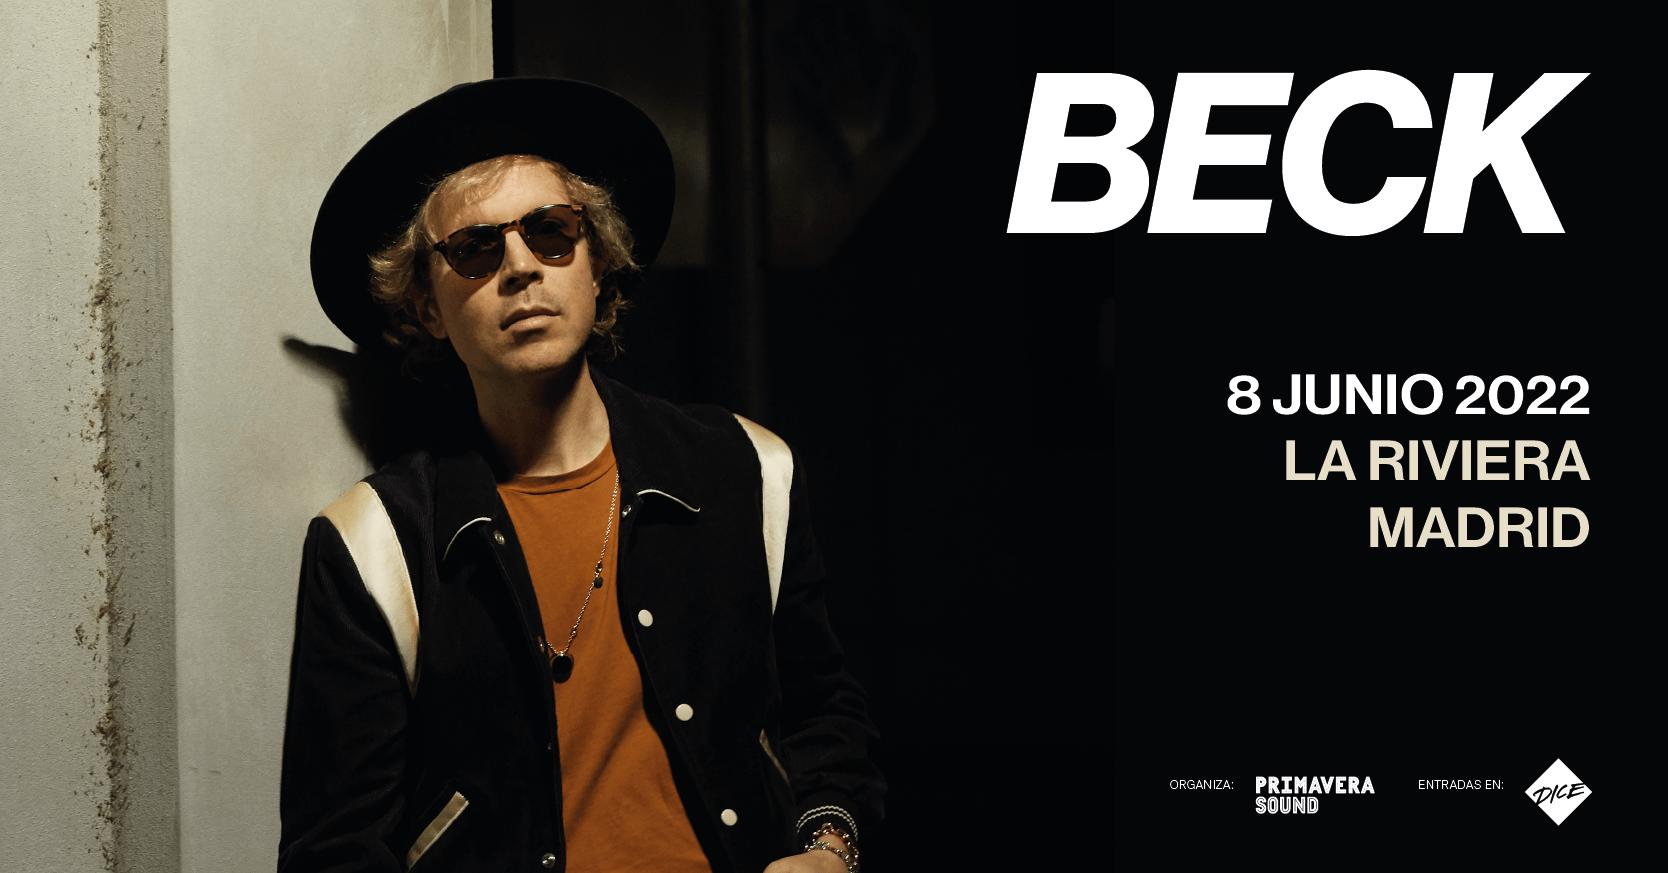 Beck(música, juguetes & ruido) - Página 6 E_38wU2VQAgofxI?format=png&name=large